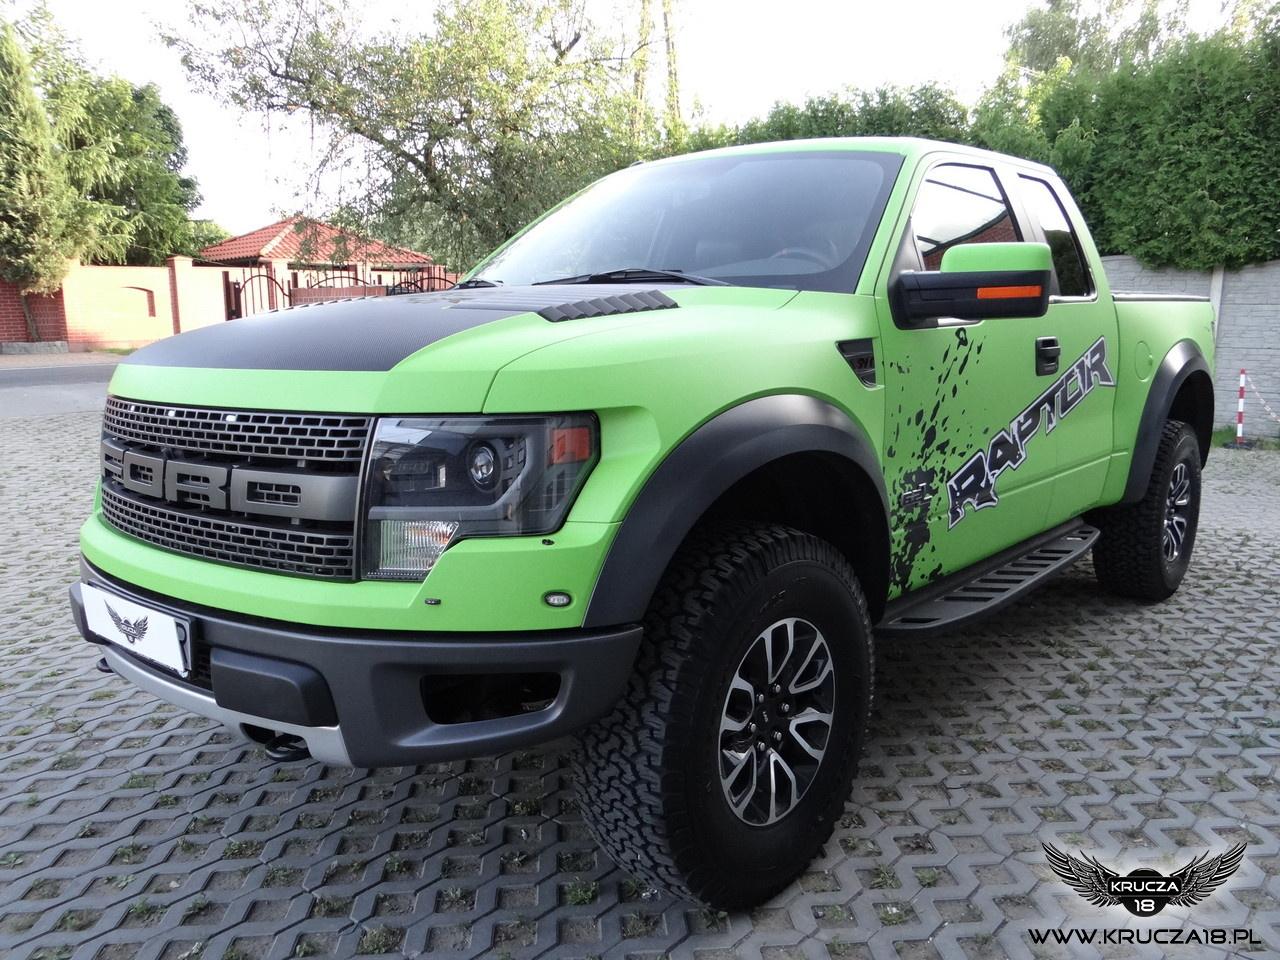 Ford F150 Raptor SVT - Green Matt